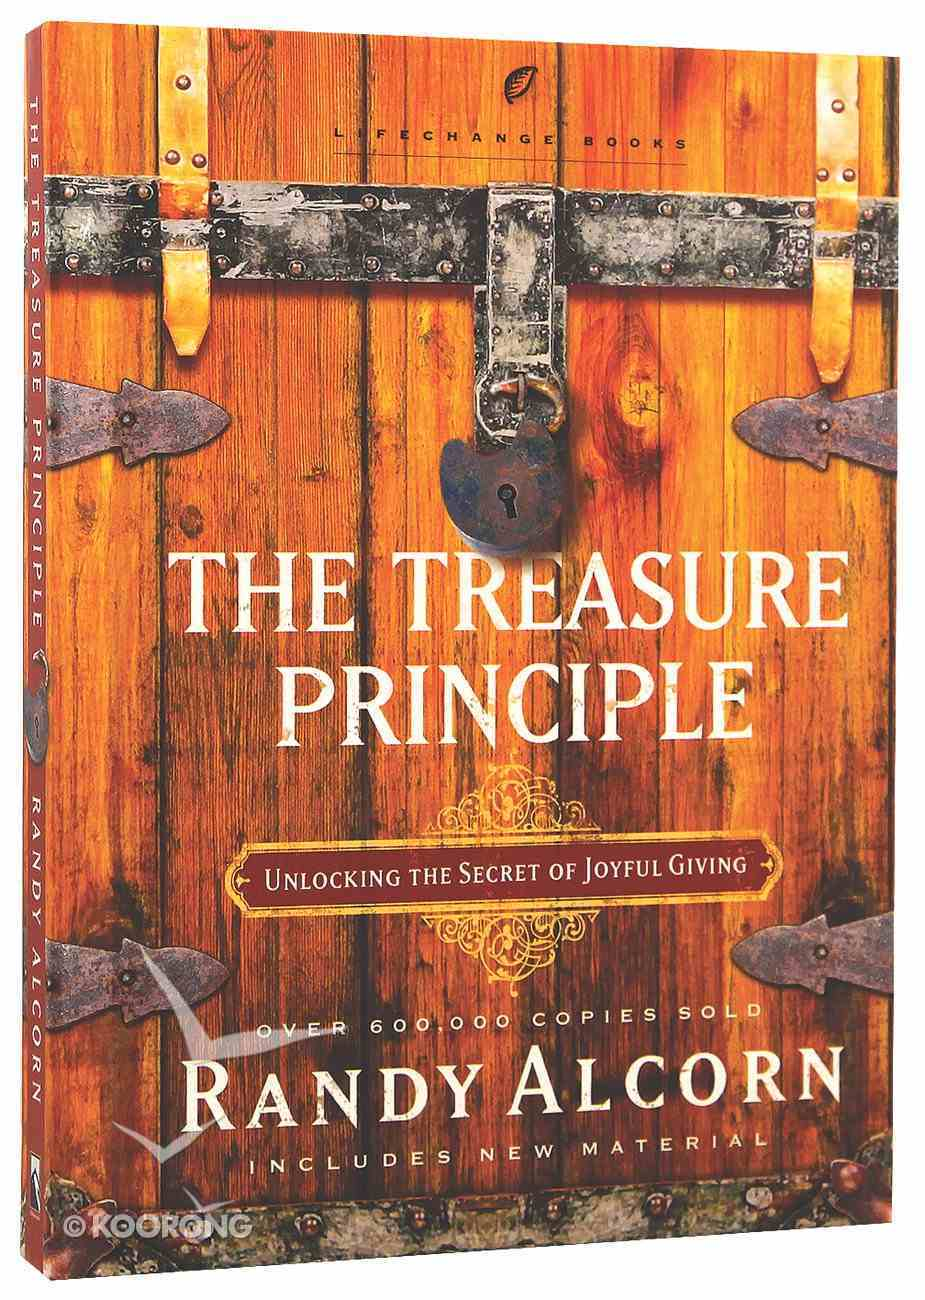 The Treasure Principle (Lifechange Books Series) Hardback